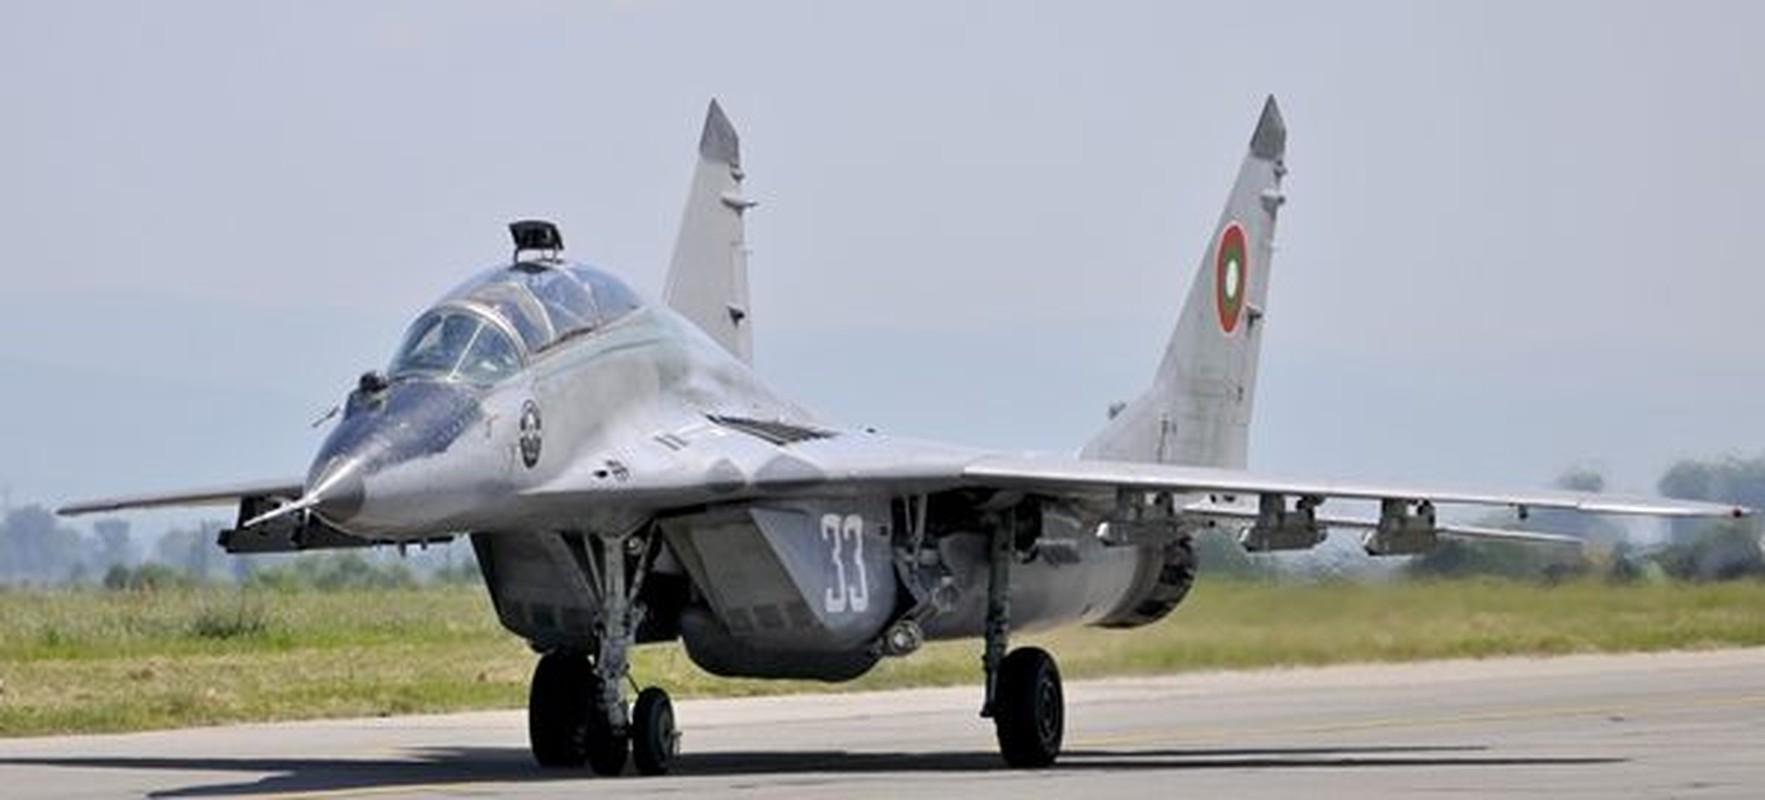 F-16 Tho Nhi Ky danh chan Tu-22M3 Nga tren bien Den: Crimea day song-Hinh-2